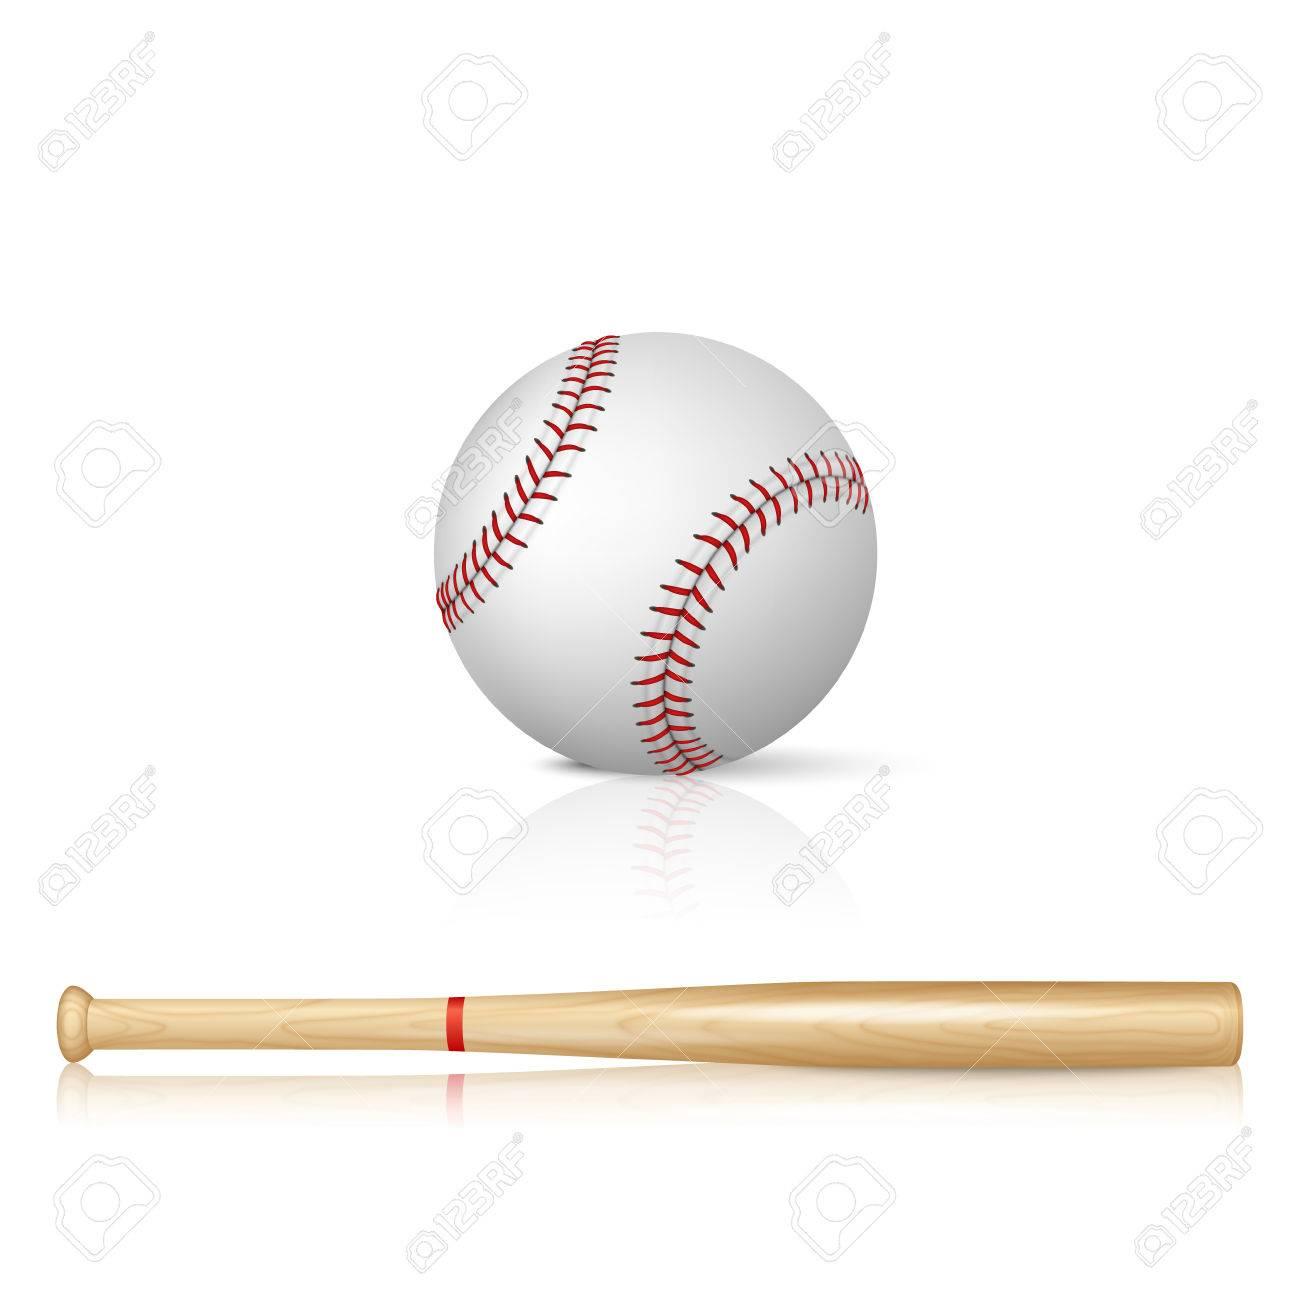 Realistic baseball bat and baseball with reflection on white background - 37943810